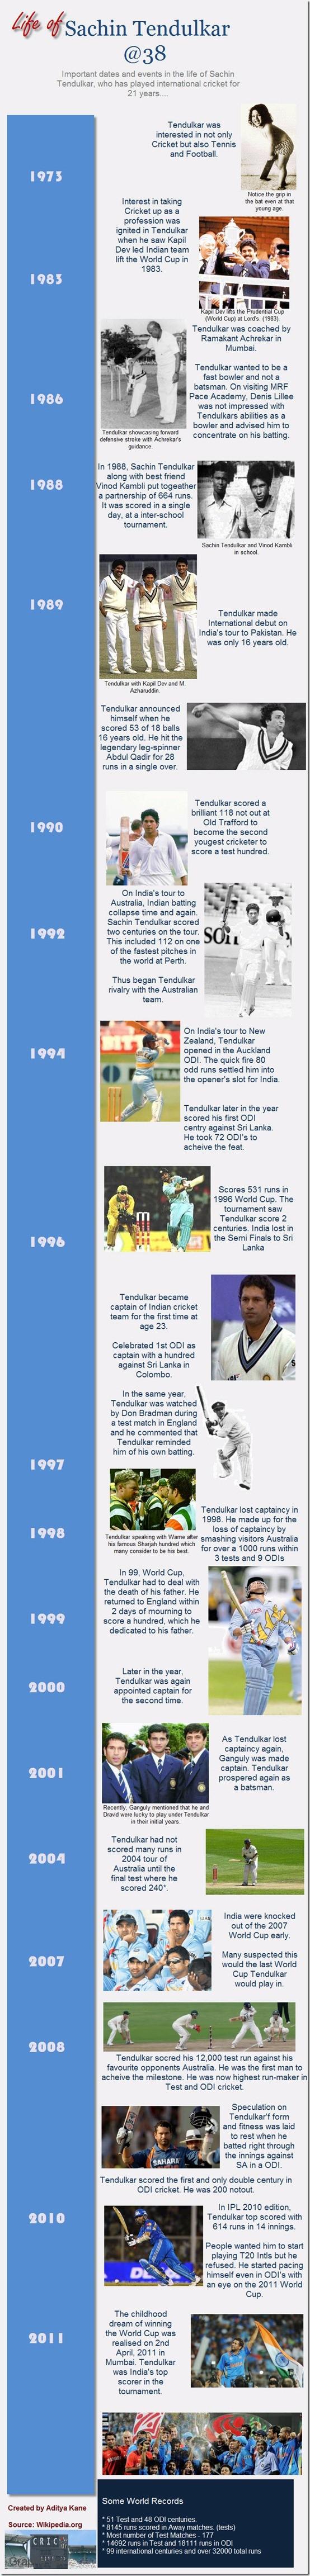 The life of Sachin Tendulkar